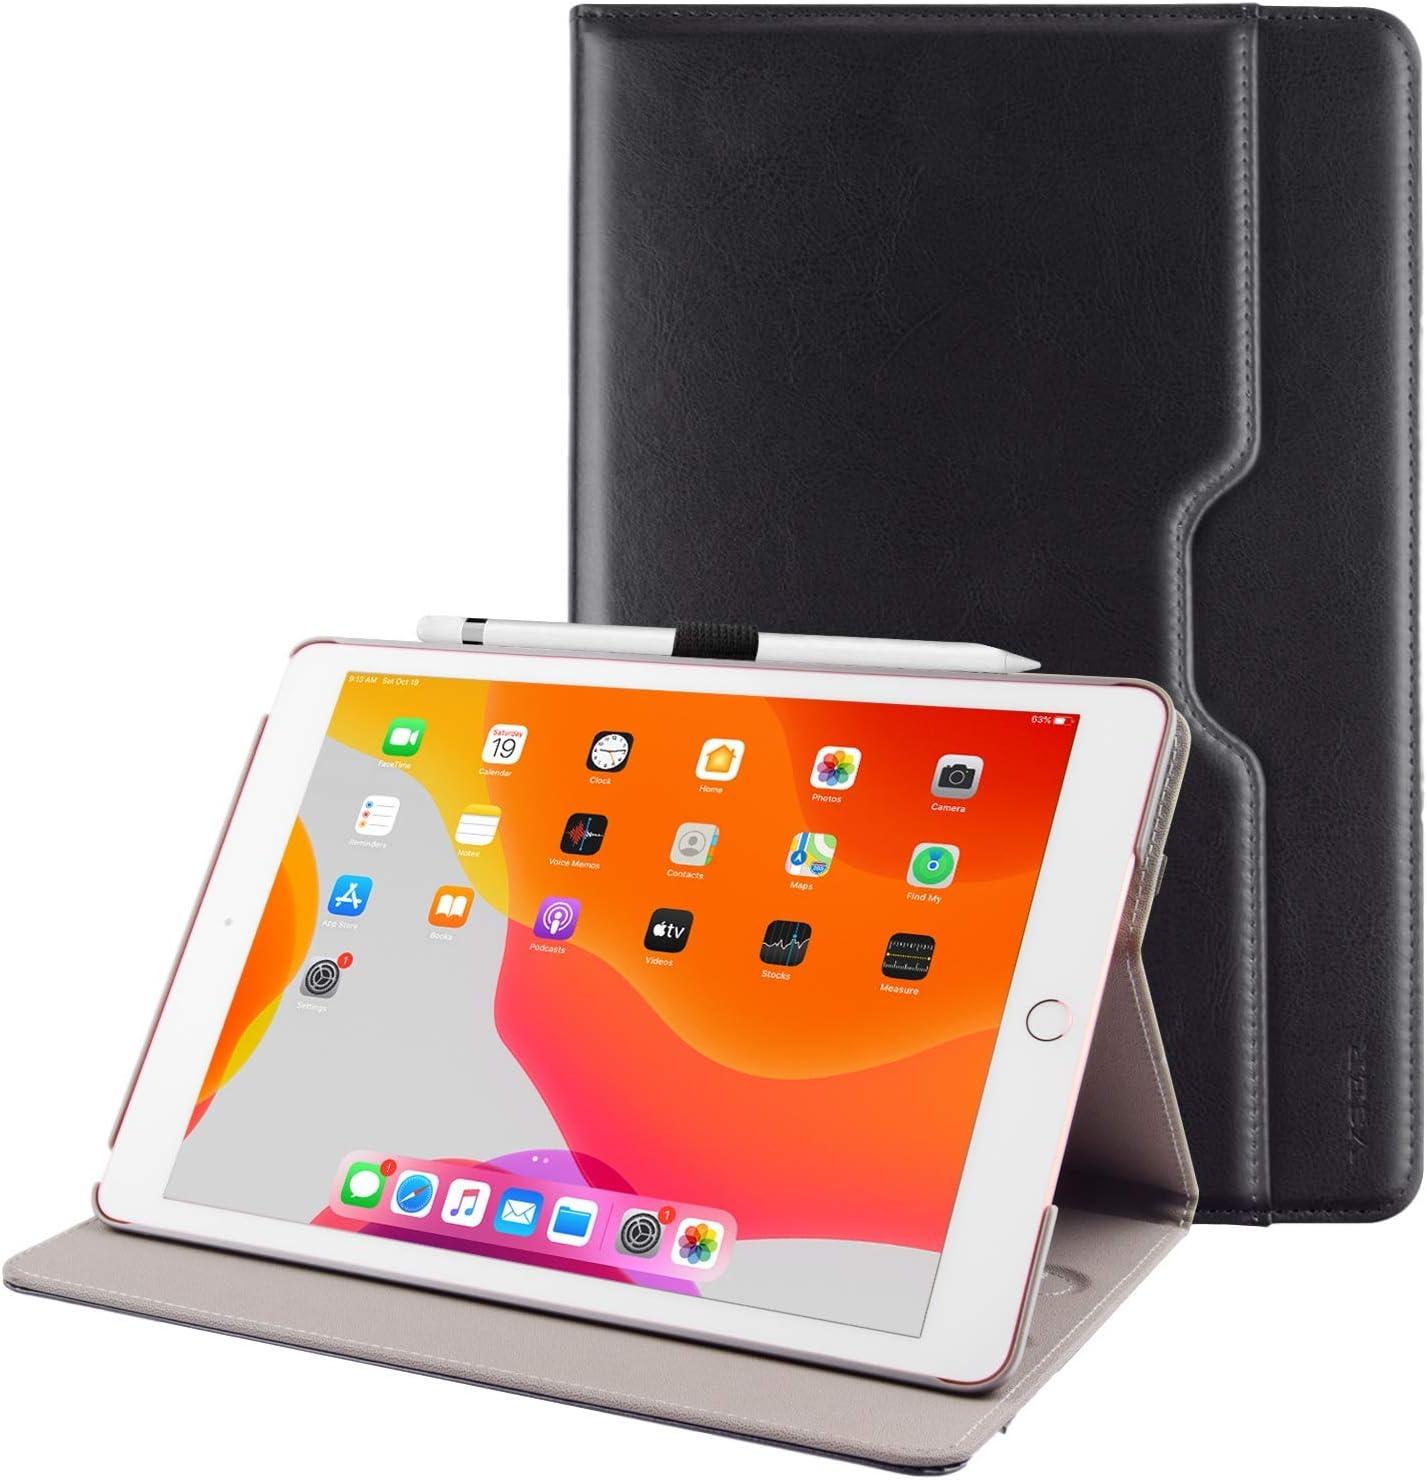 Topics on TV VSER Case for New iPad 8th 7th Under blast sales Inch Pr Generation 10.2 2020 2019